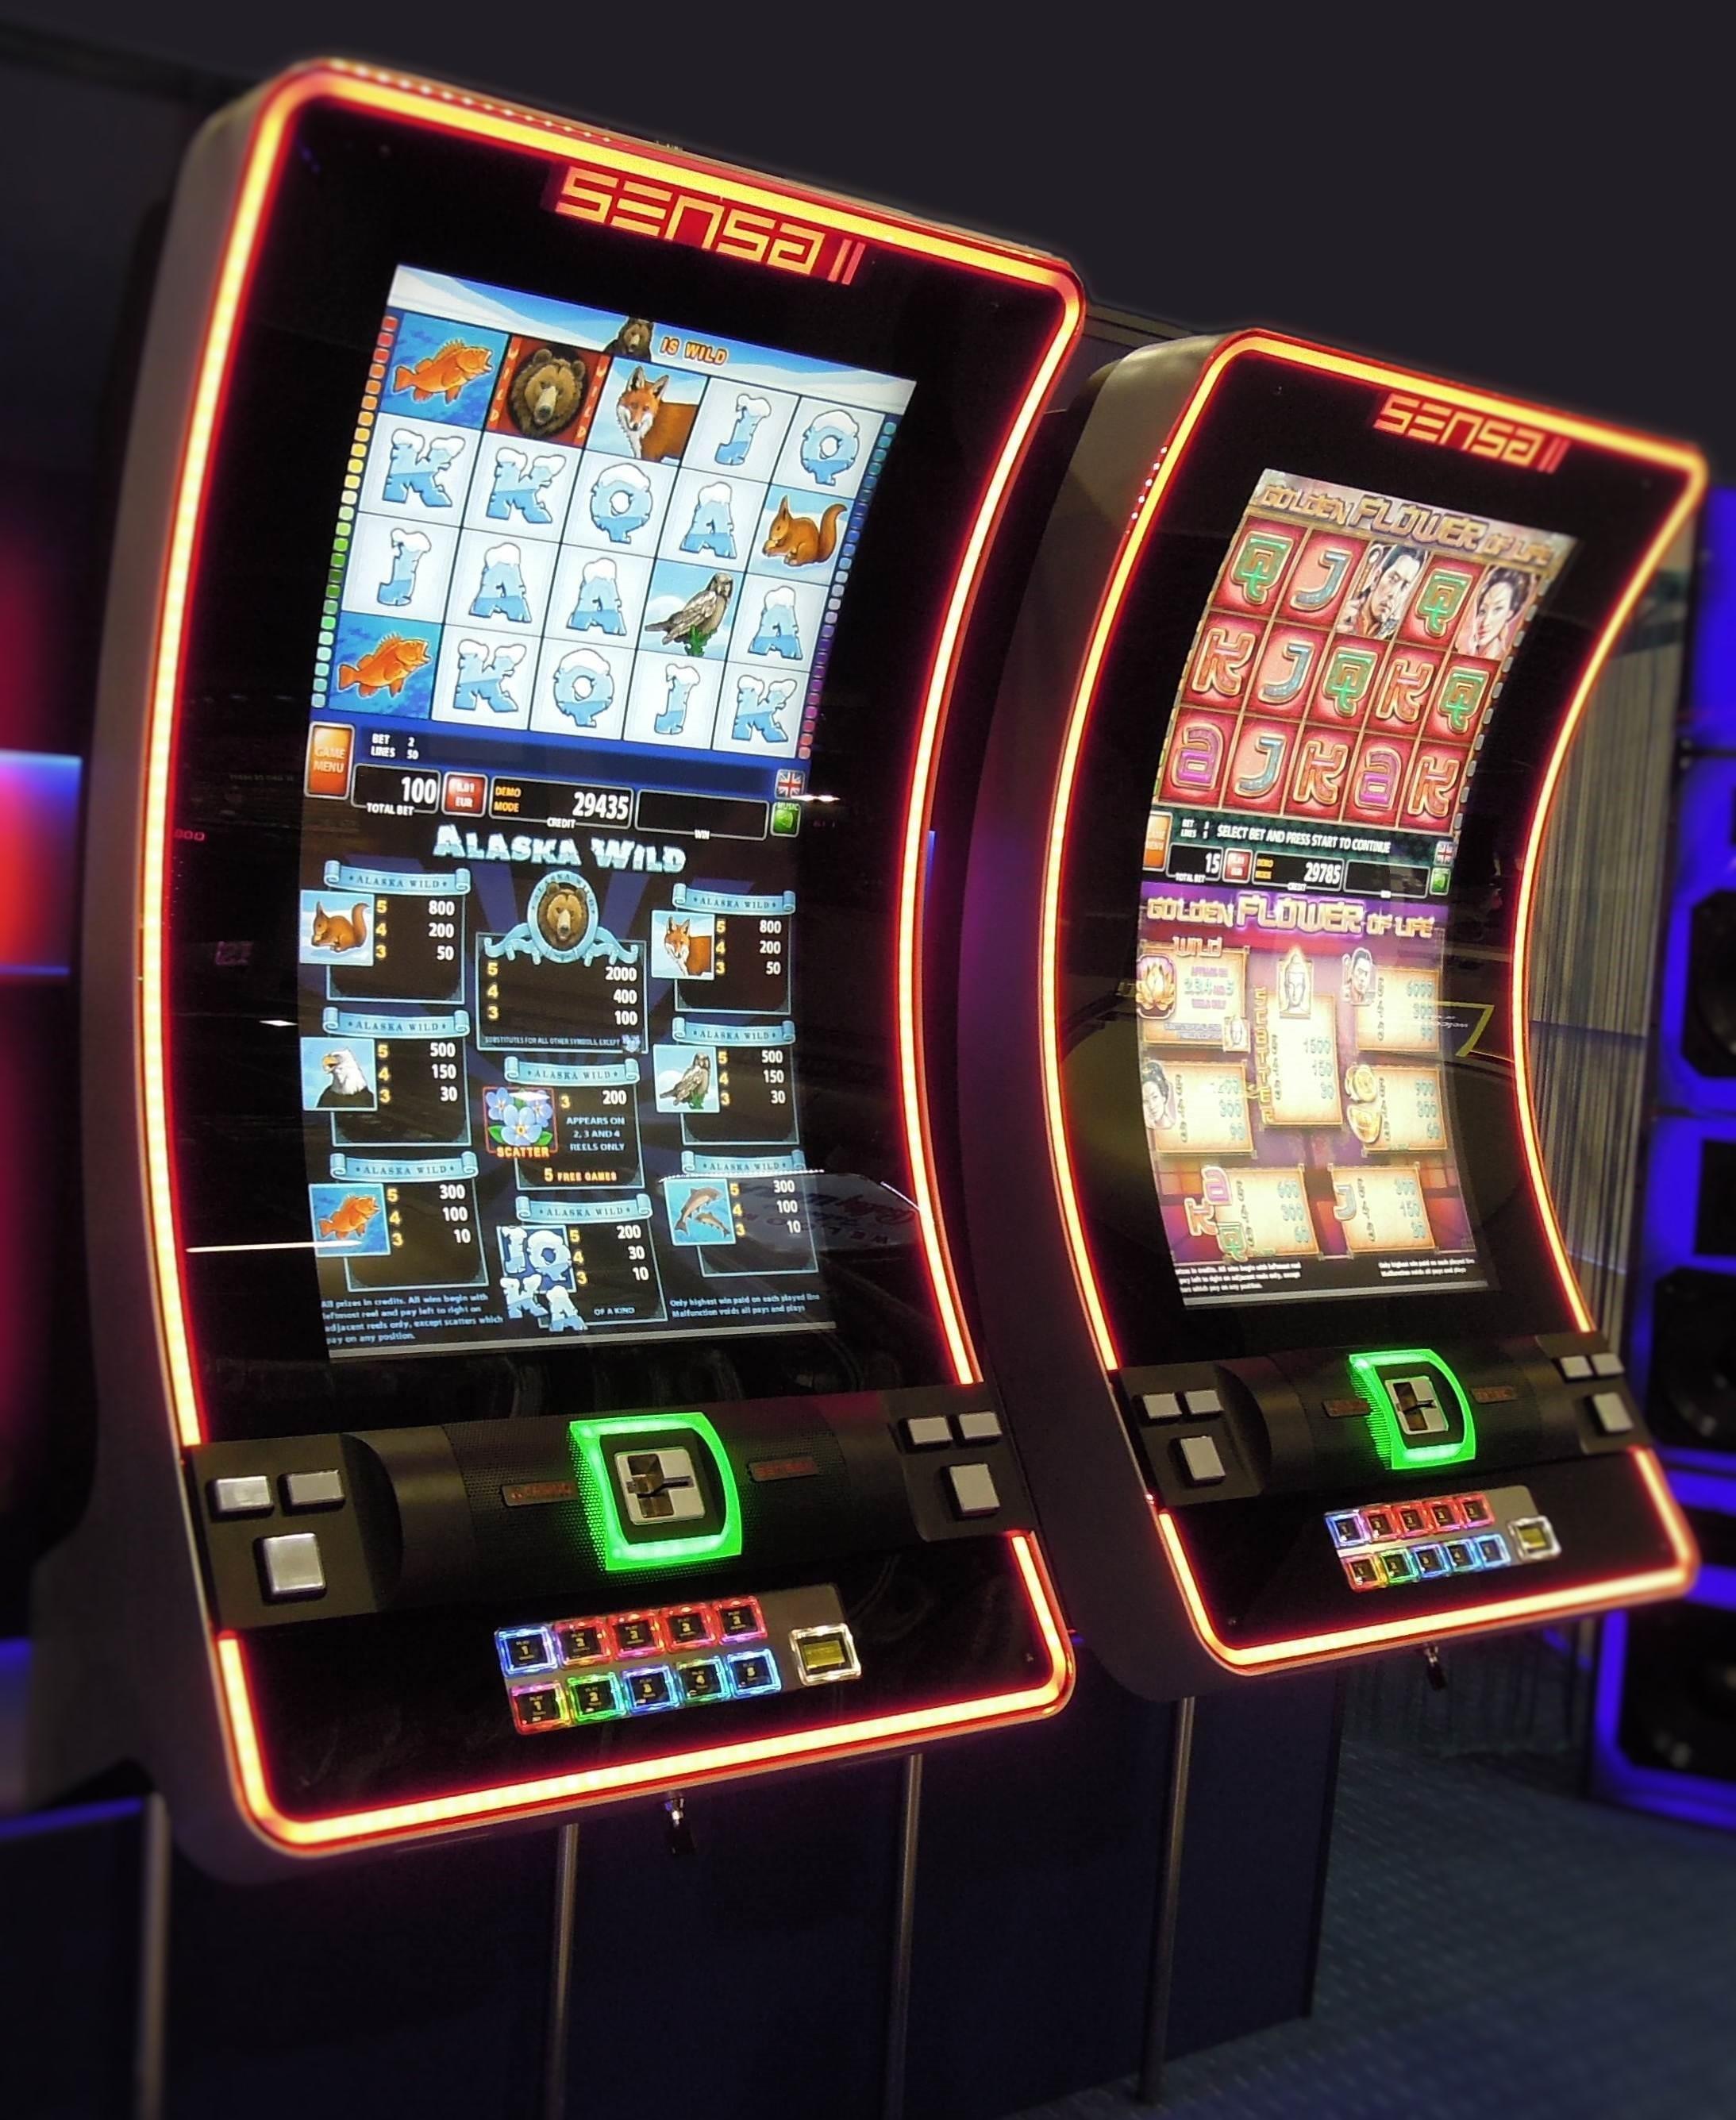 Jugar video slot mejores casino Palma - 73093